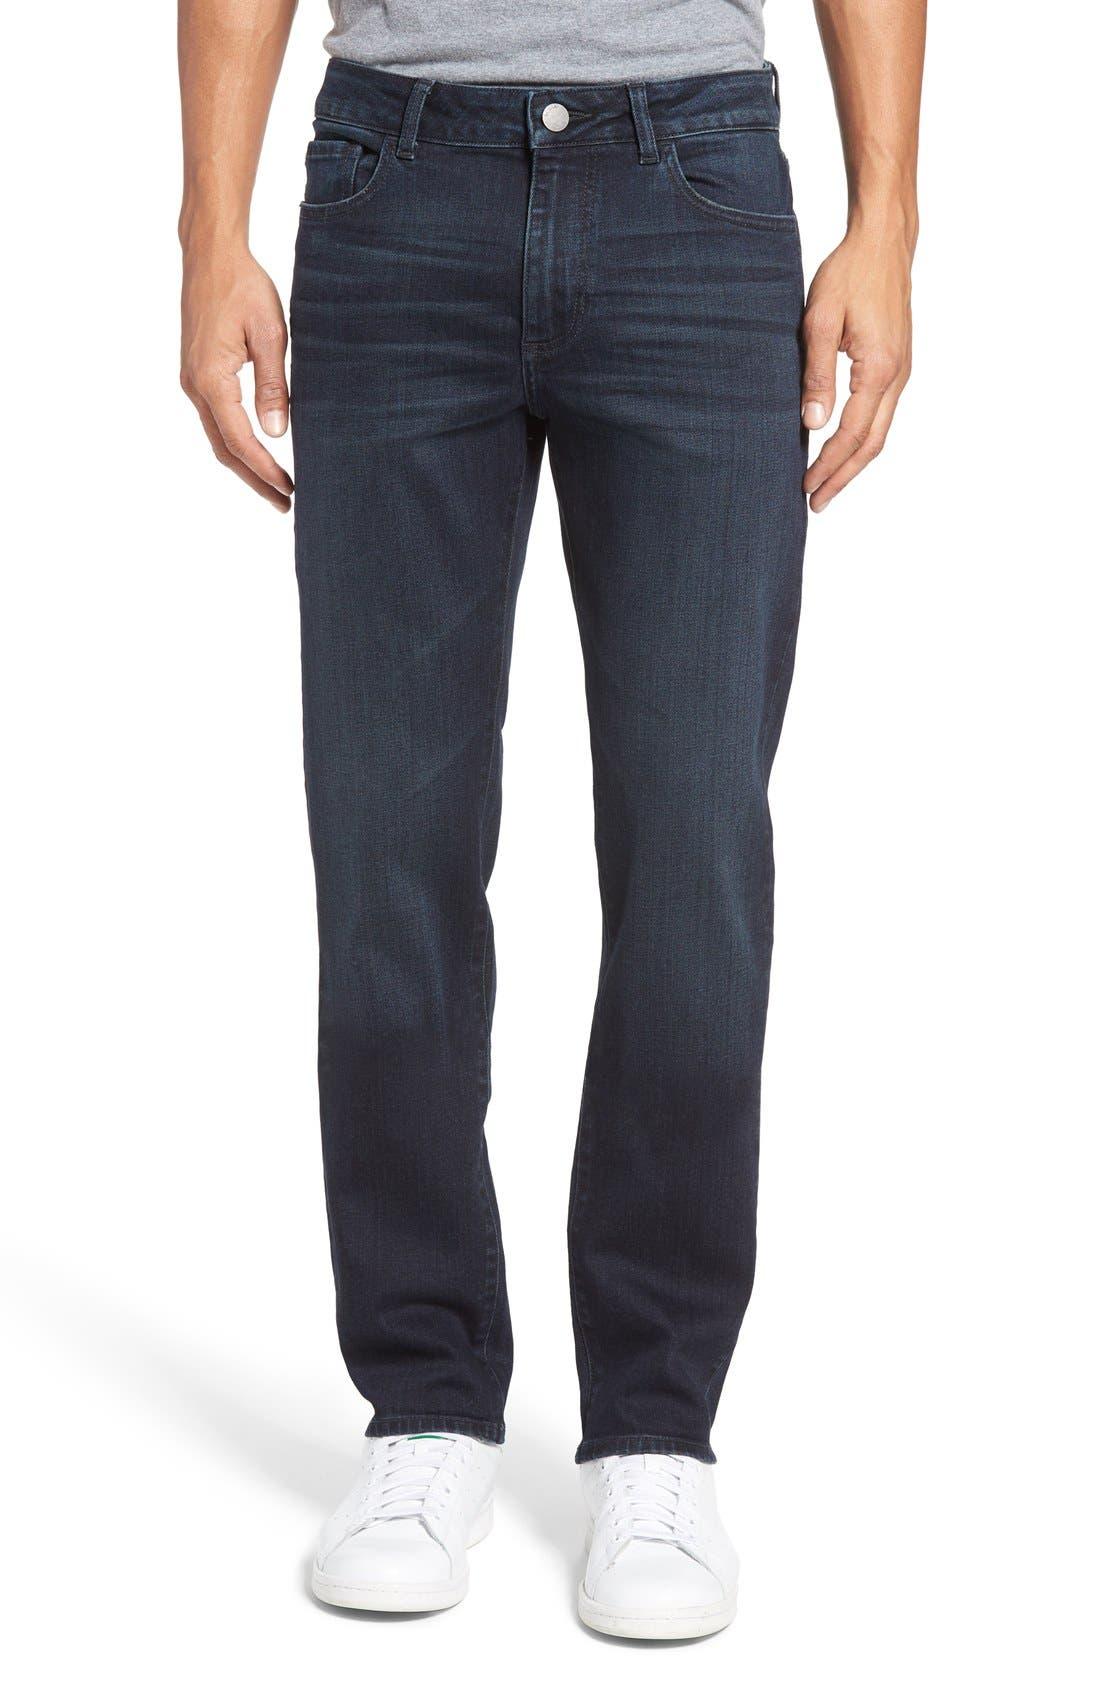 DL1961 Nick Slim Fit Jeans (Anvil)